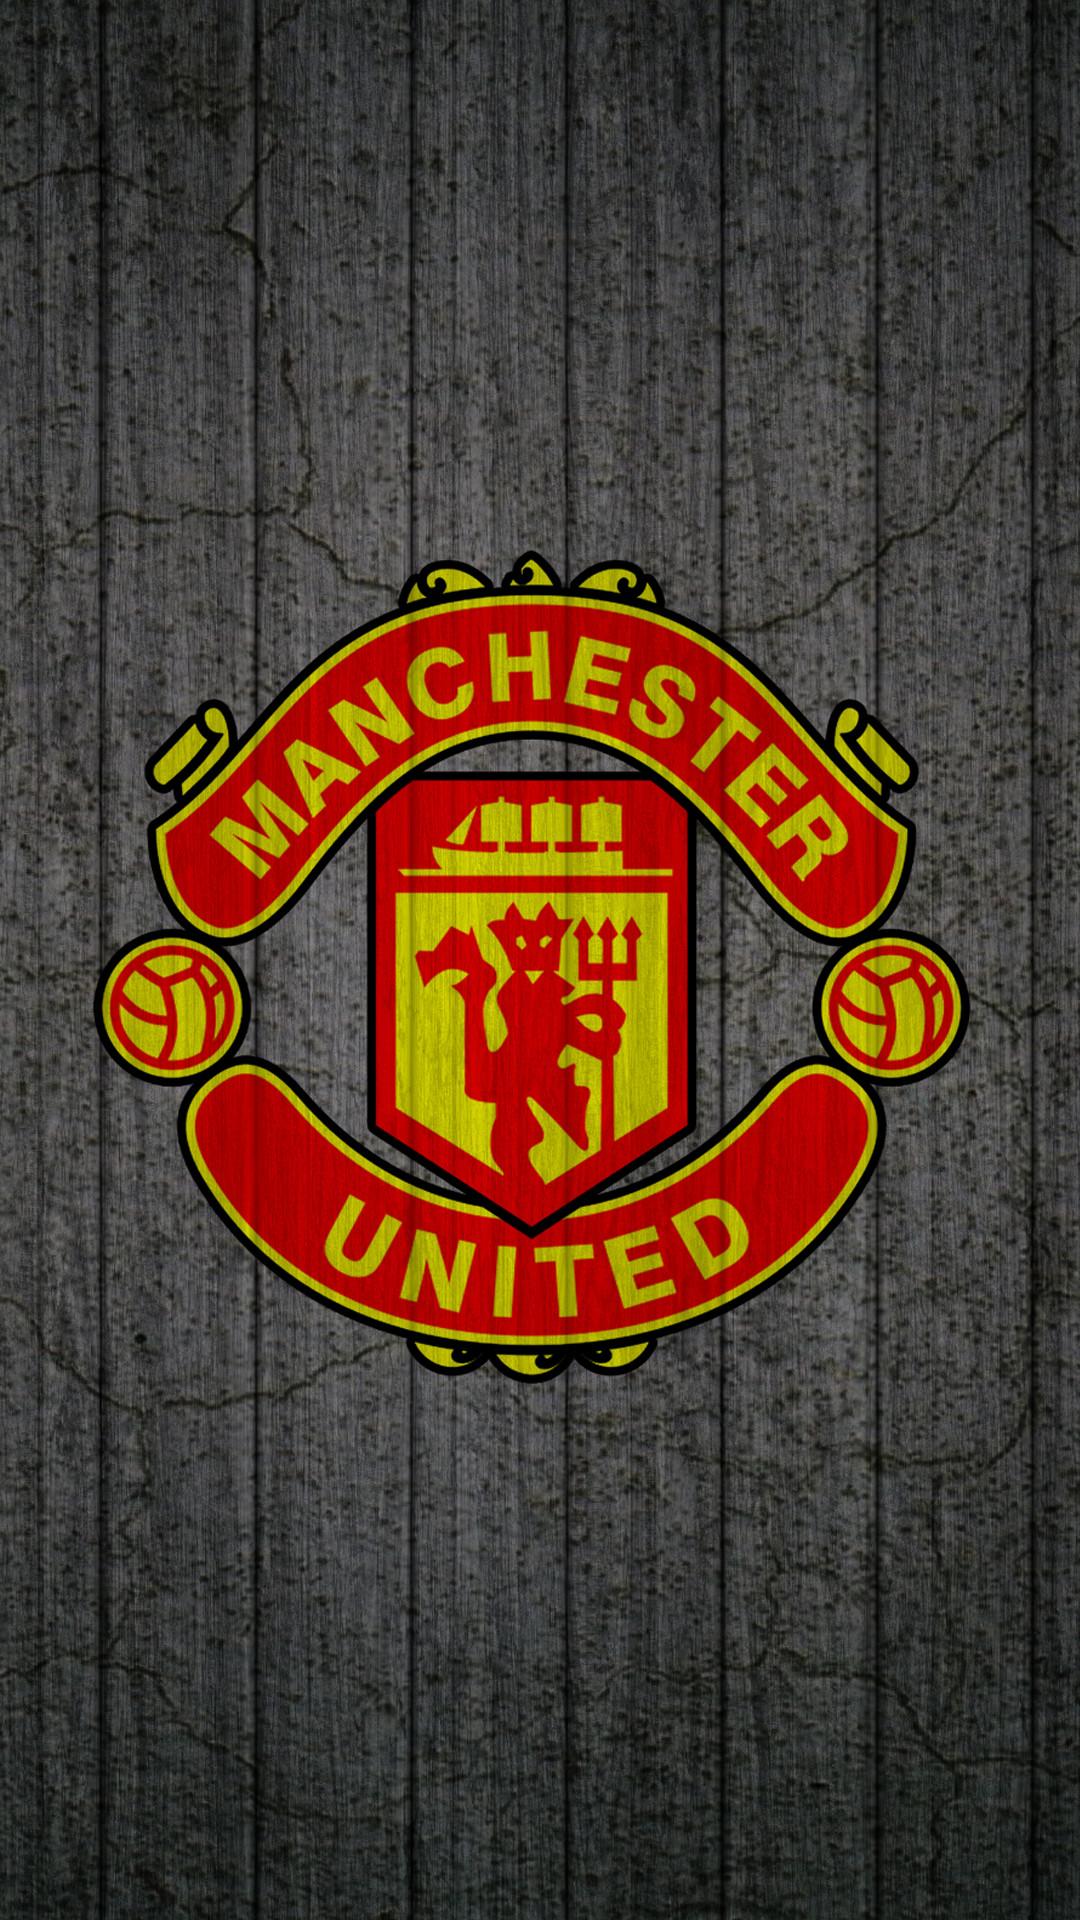 Apple iPhone 6 Plus HD Wallpaper – Manchester United Logo | HD Wallpaper  Download for Desktop